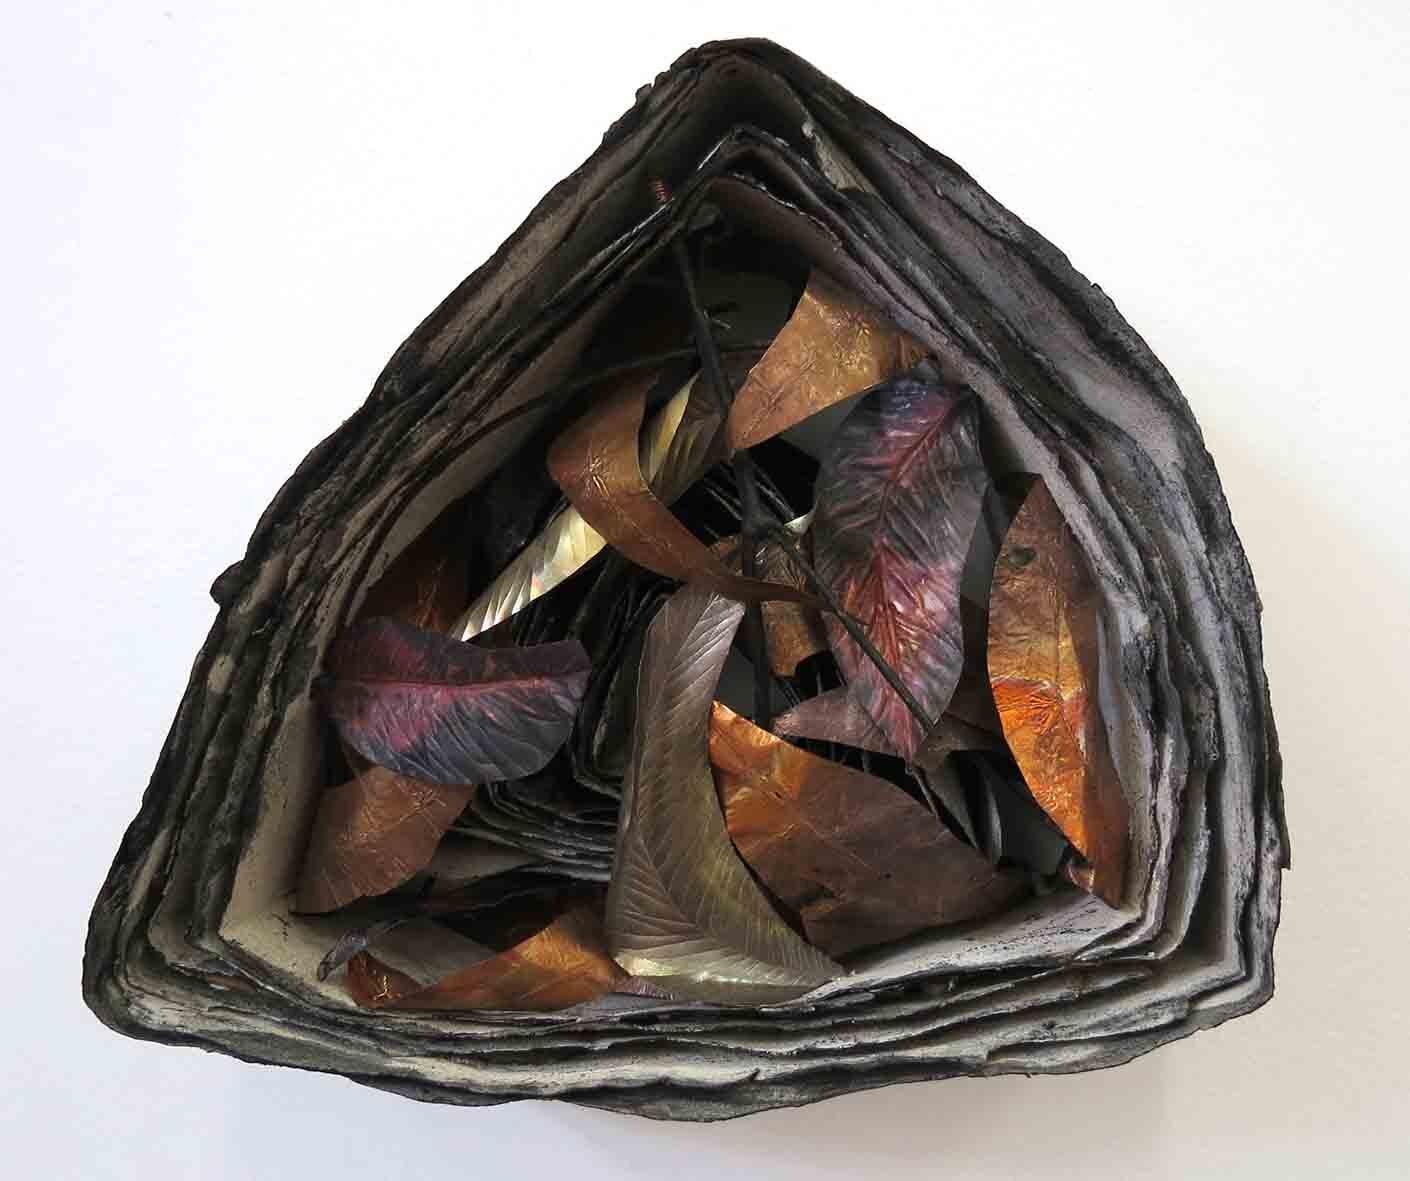 36. Monique Tippett, Marri, 2019, recycled paper, ash, charcoal, copper, 25 x 25 x 10 cm $400